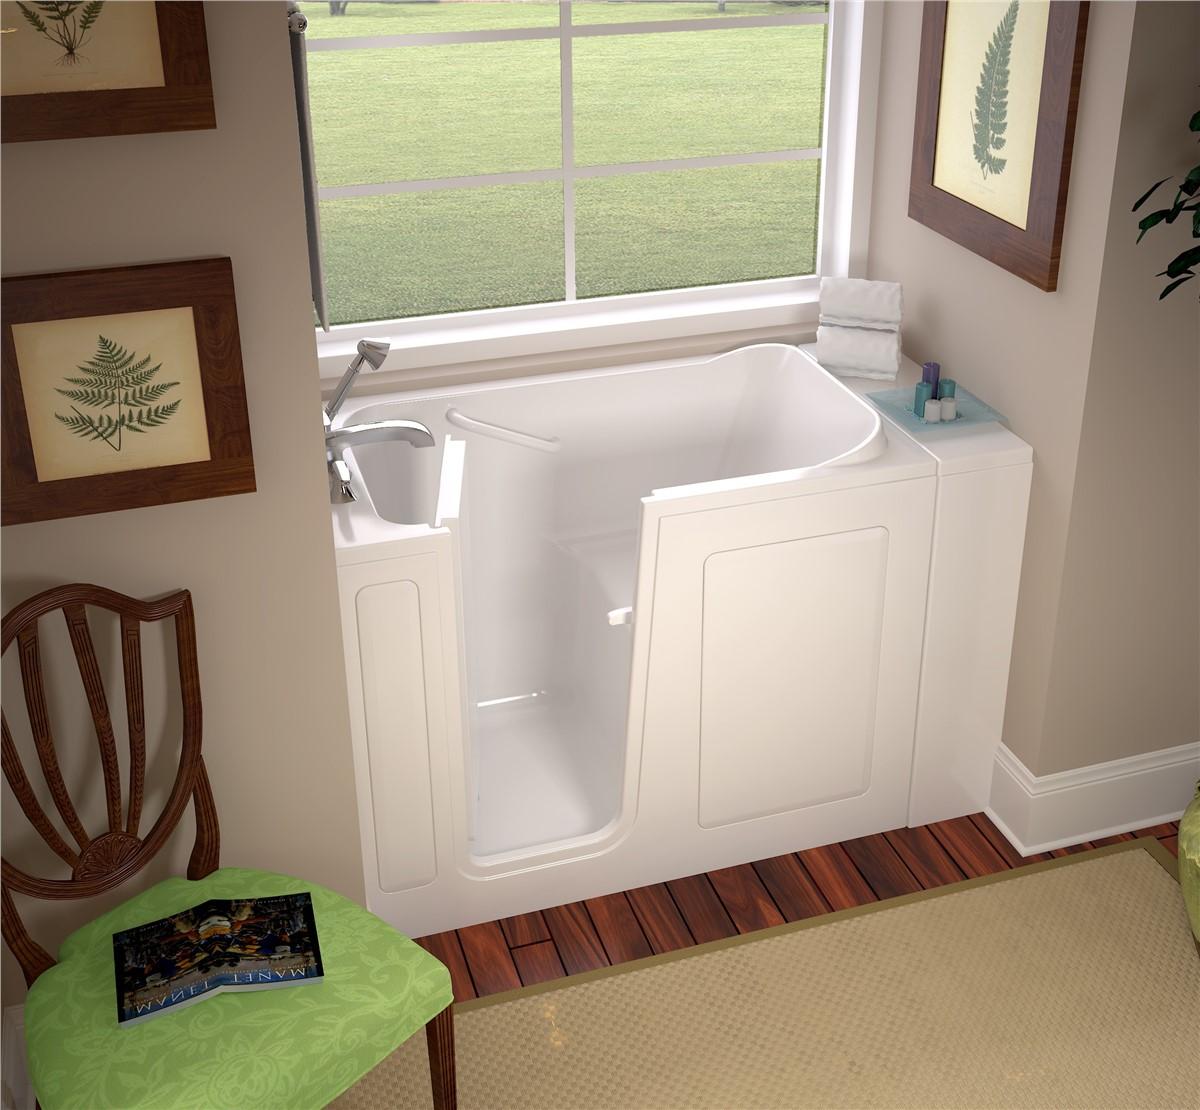 Portland Accessible Bathrooms Miller Home Renovations - Accessible bathroom remodel